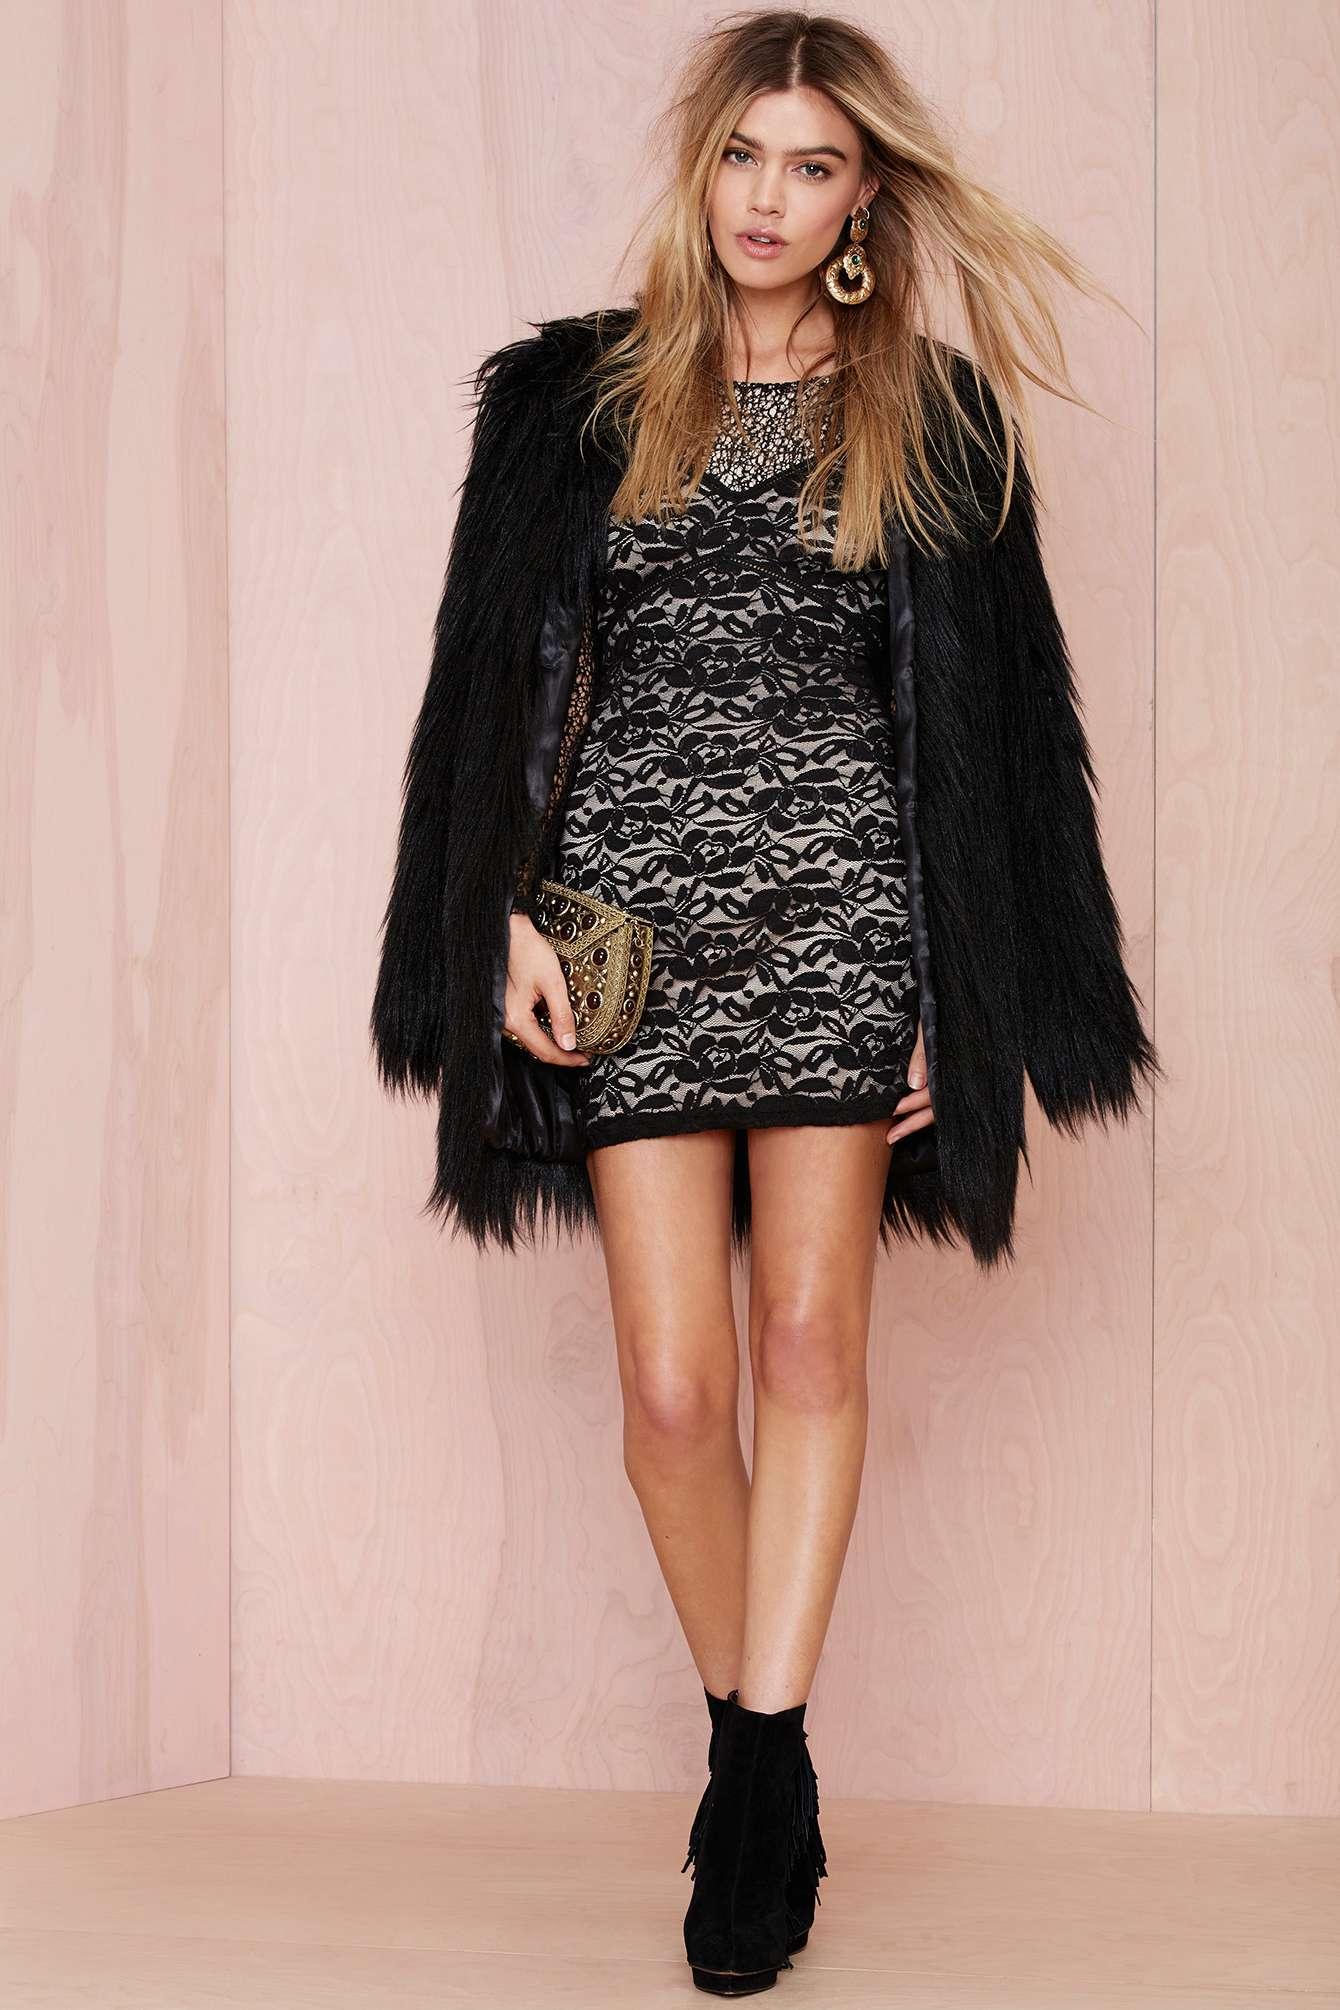 Guerlain Perfume Precio Little Black Dress lFcTJ3K1u